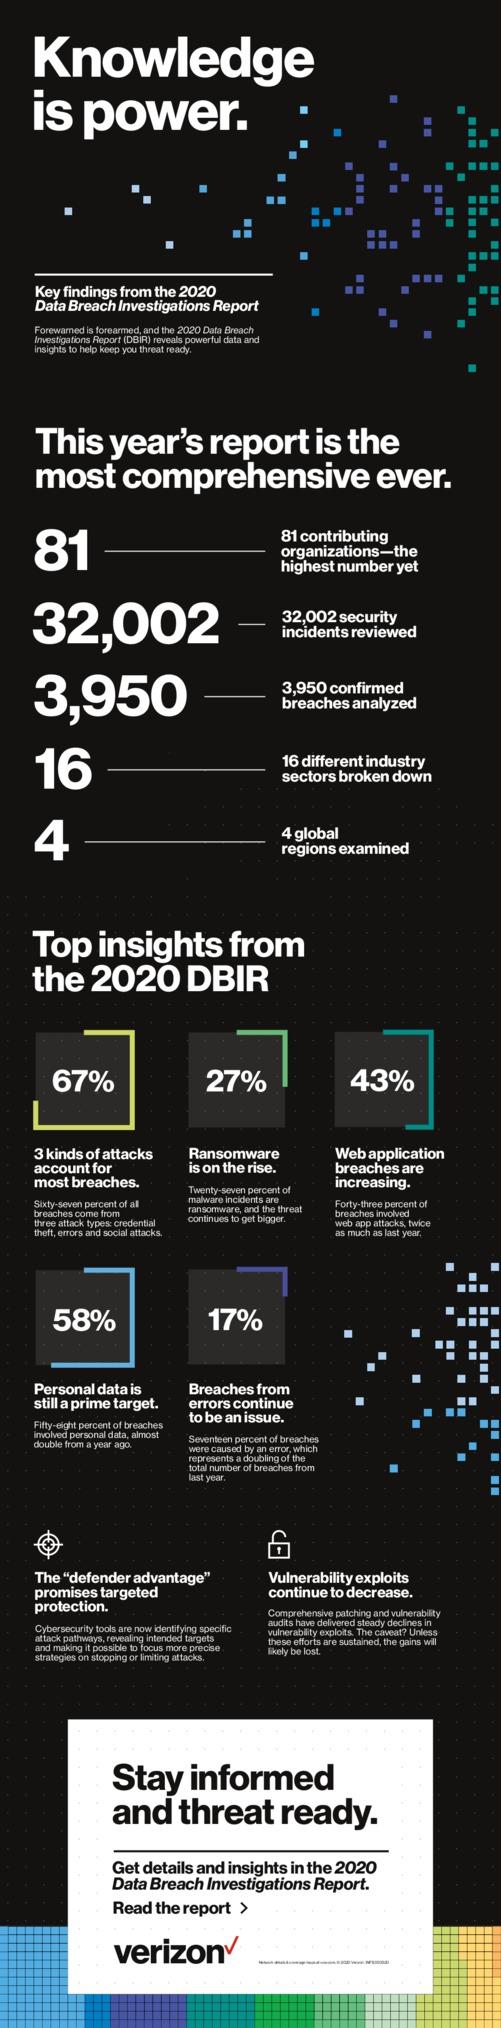 Verizon Business 2020 Data Breach Investigations Report